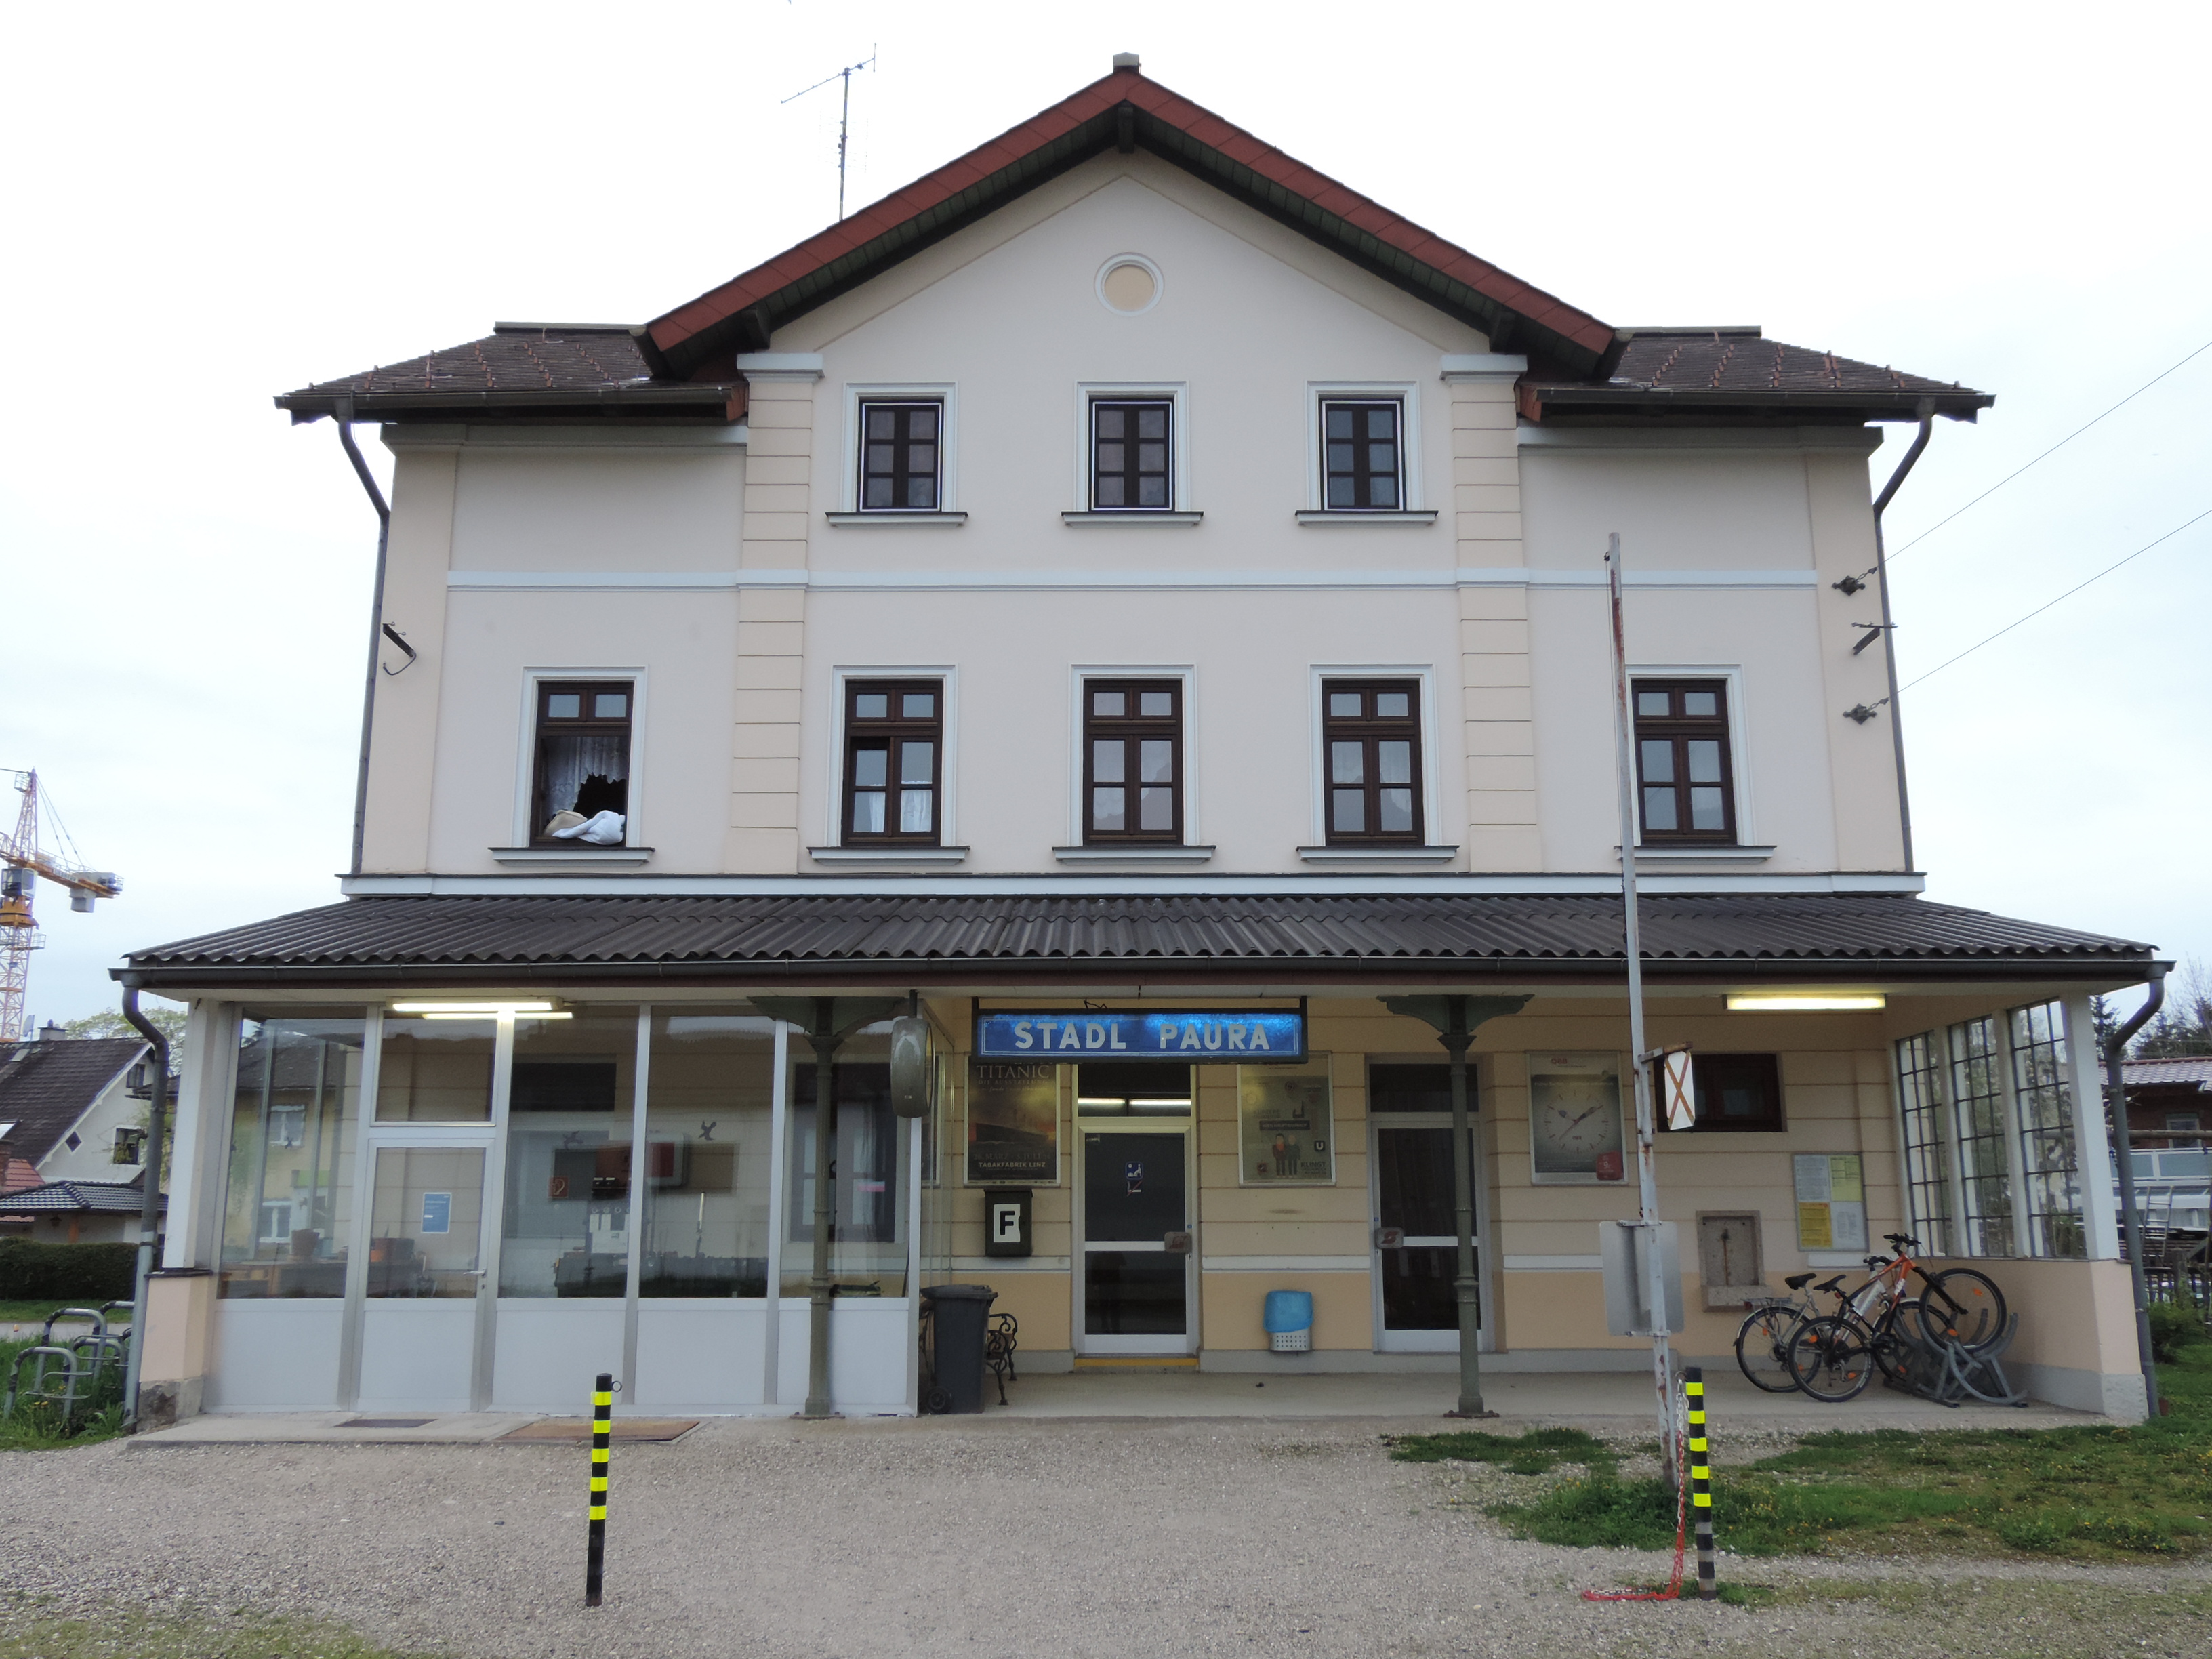 Datei:Stadl-Paura intertecinc.com Wikipedia